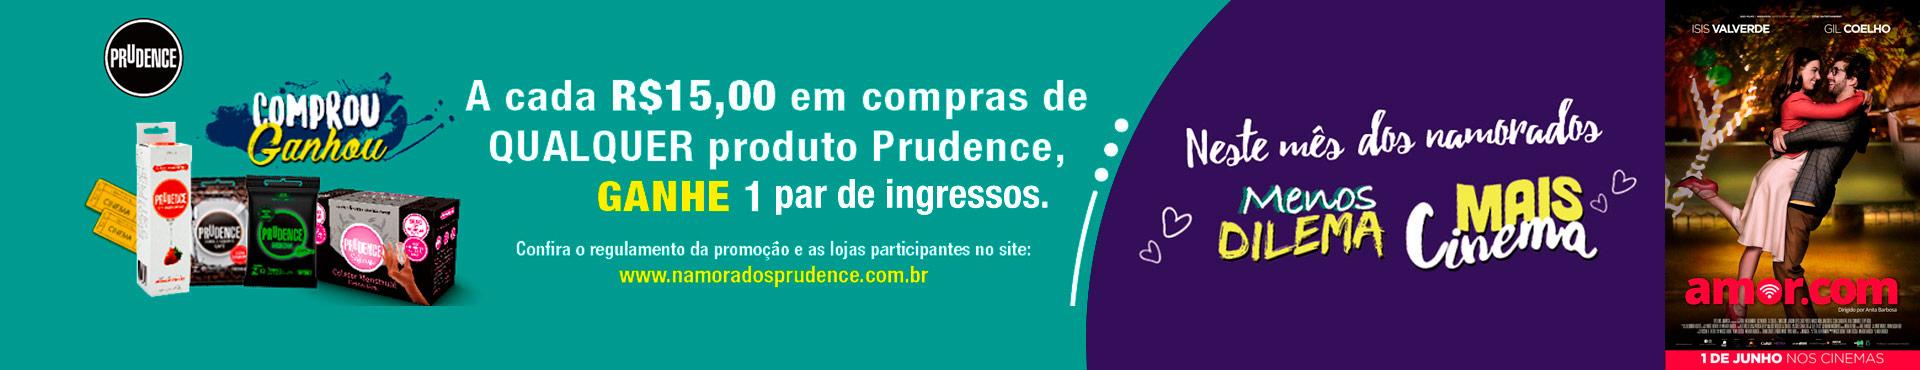 Prudence JUNHO